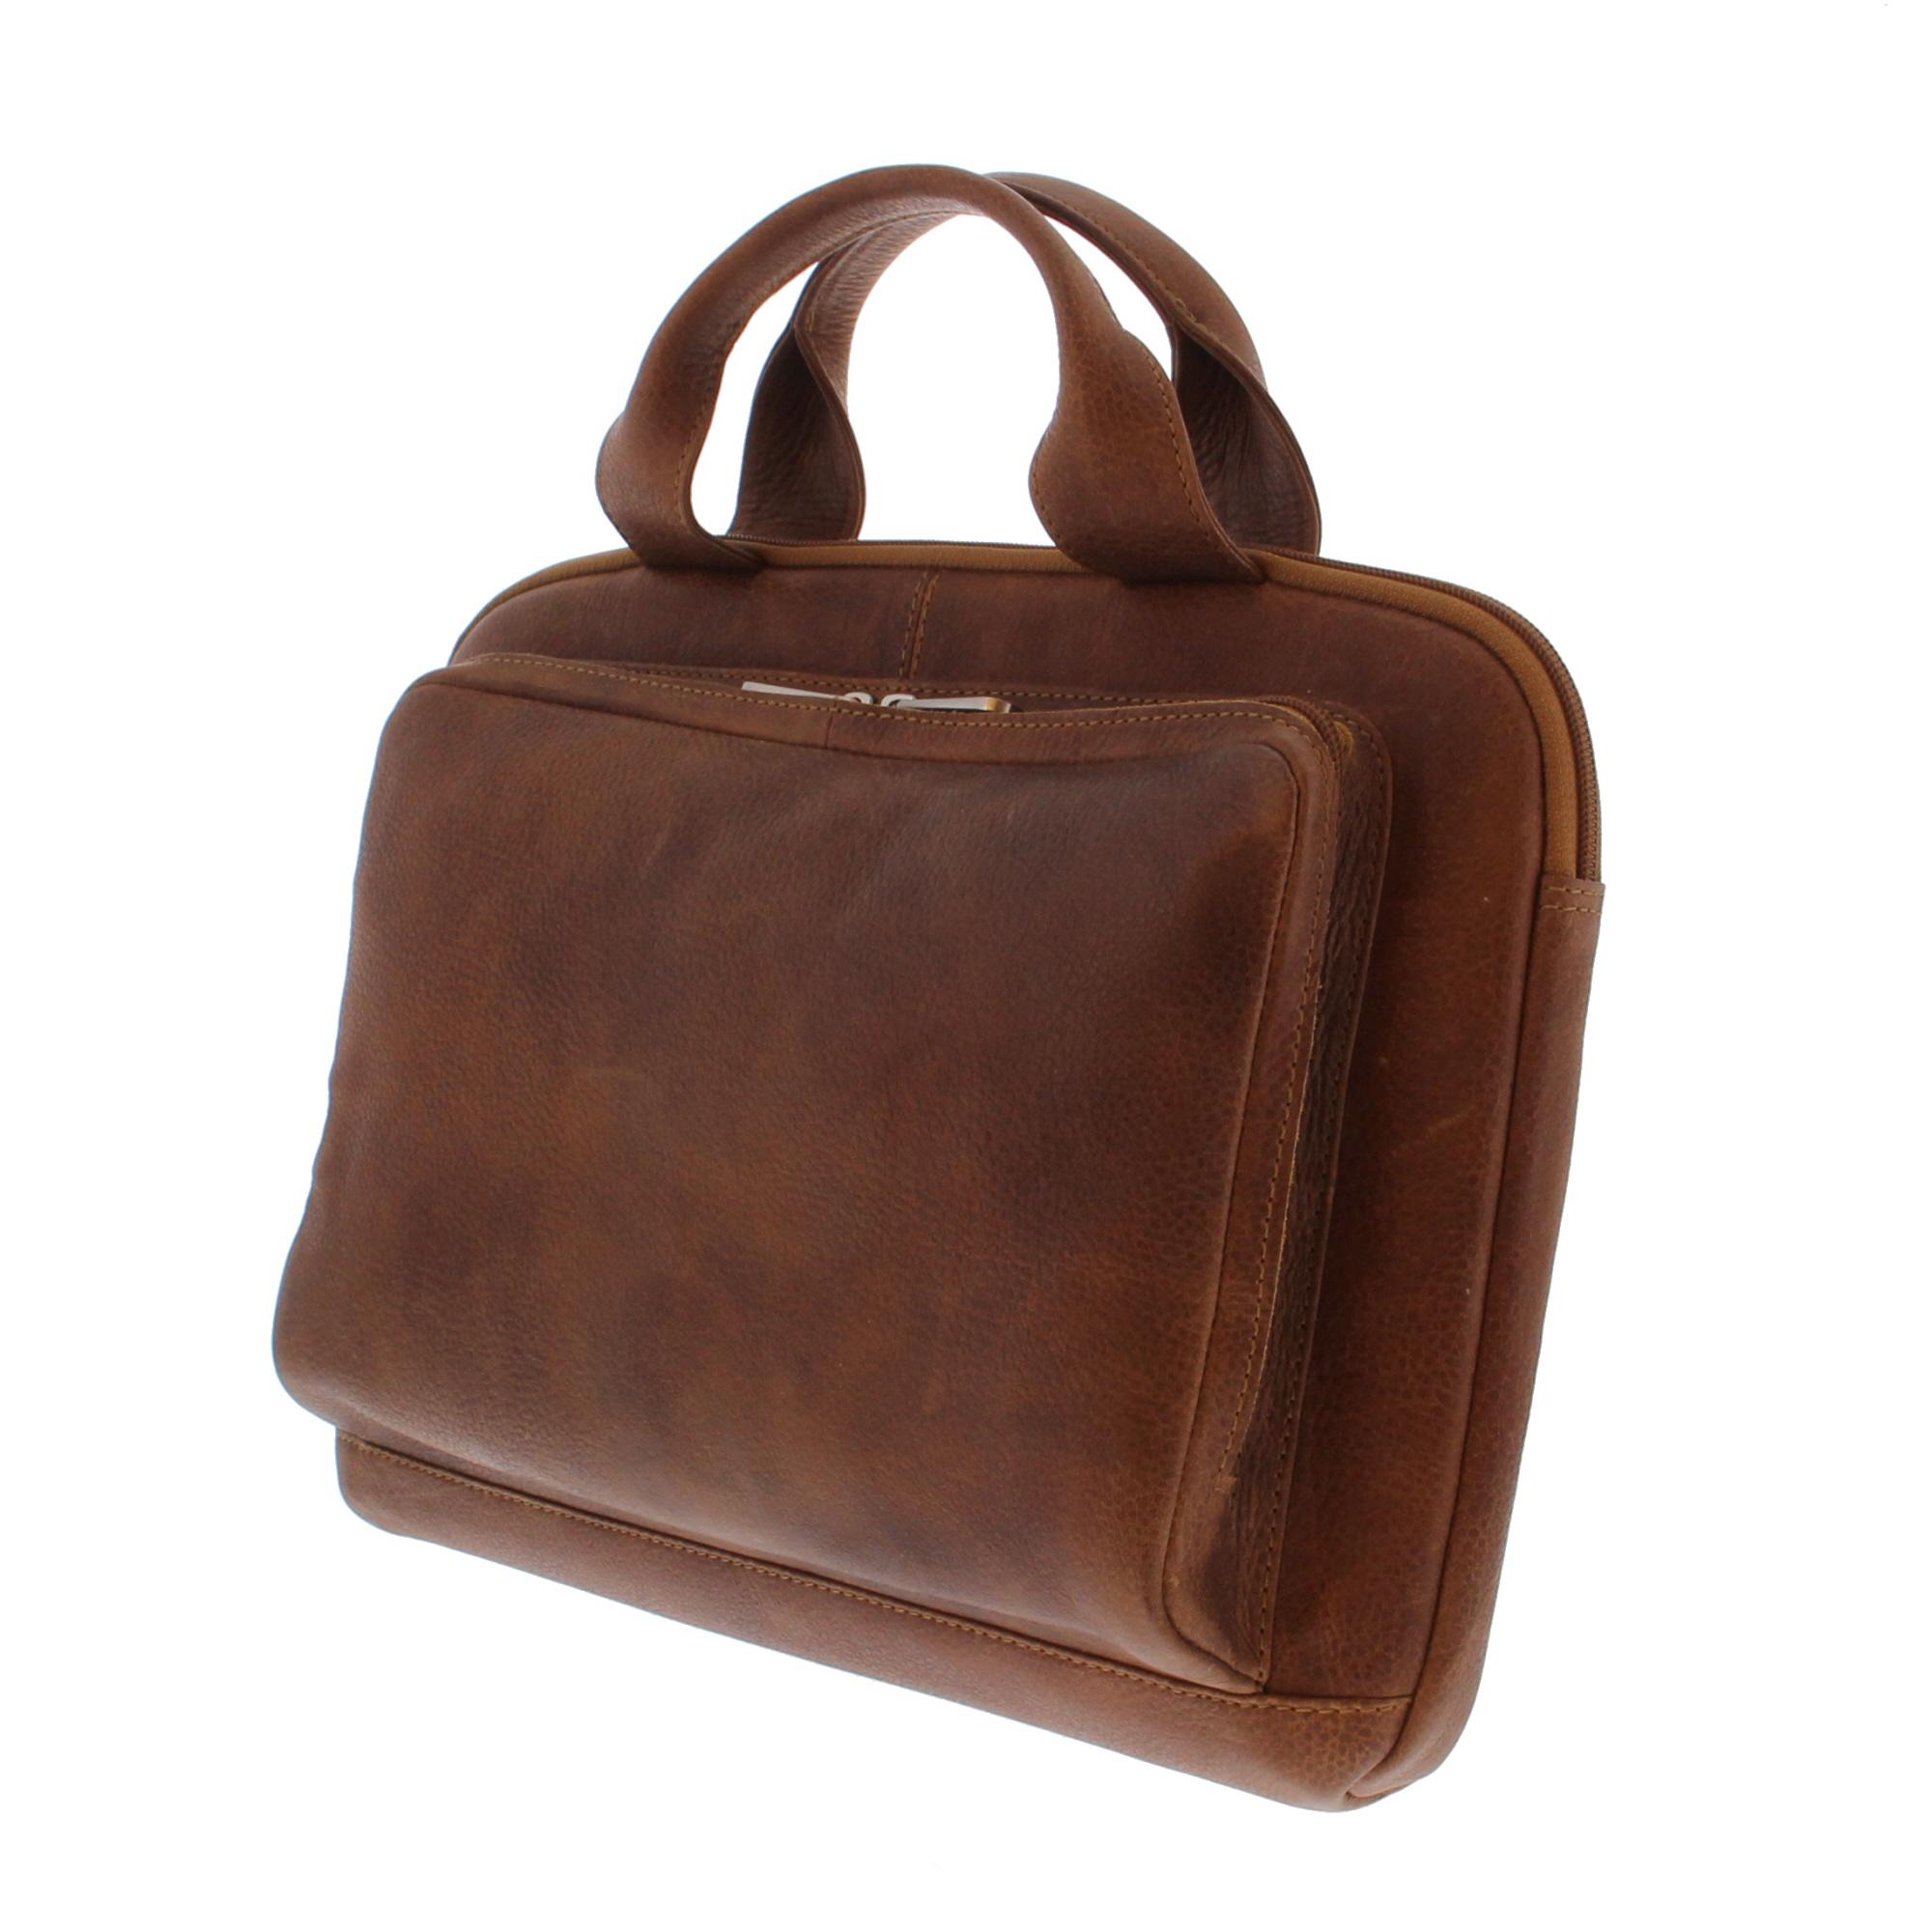 Plevier businessbags   Productfotografie Breda